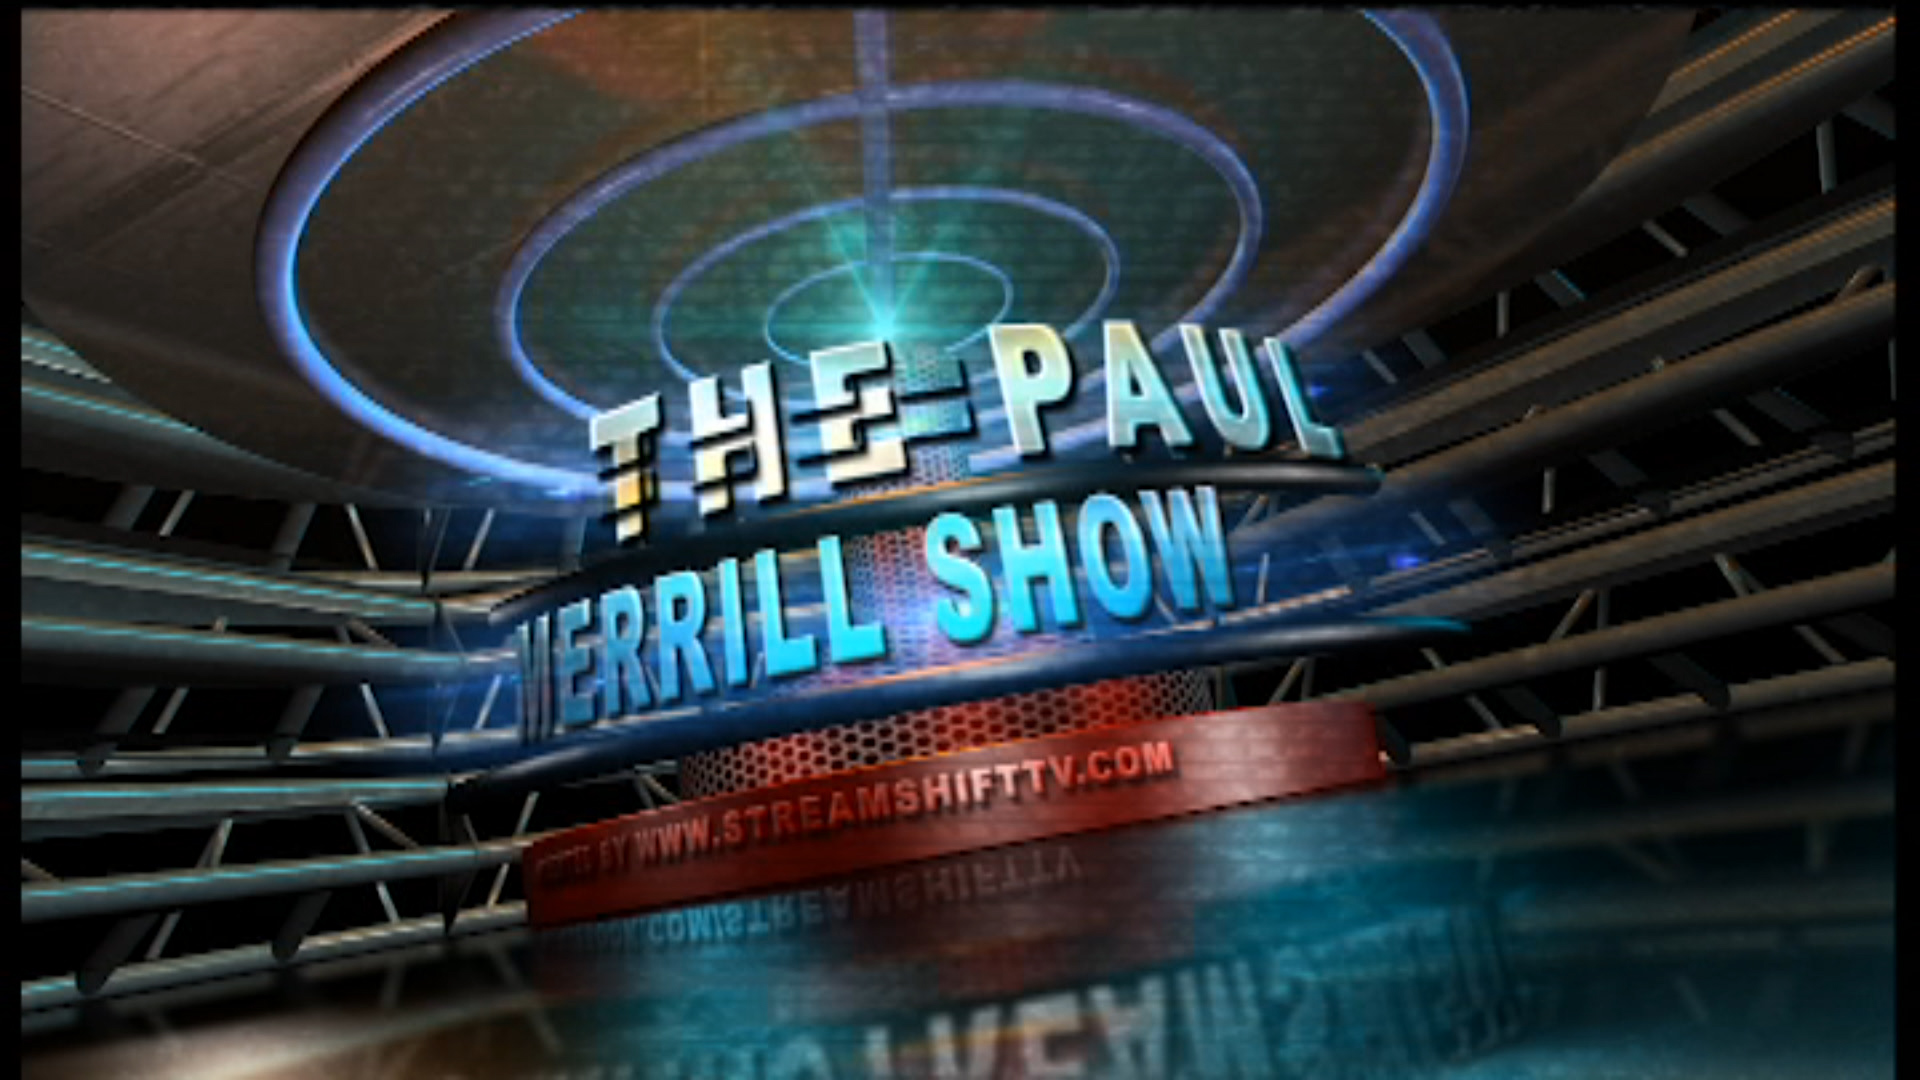 The Paul Merrill Show - February 25th, 2019